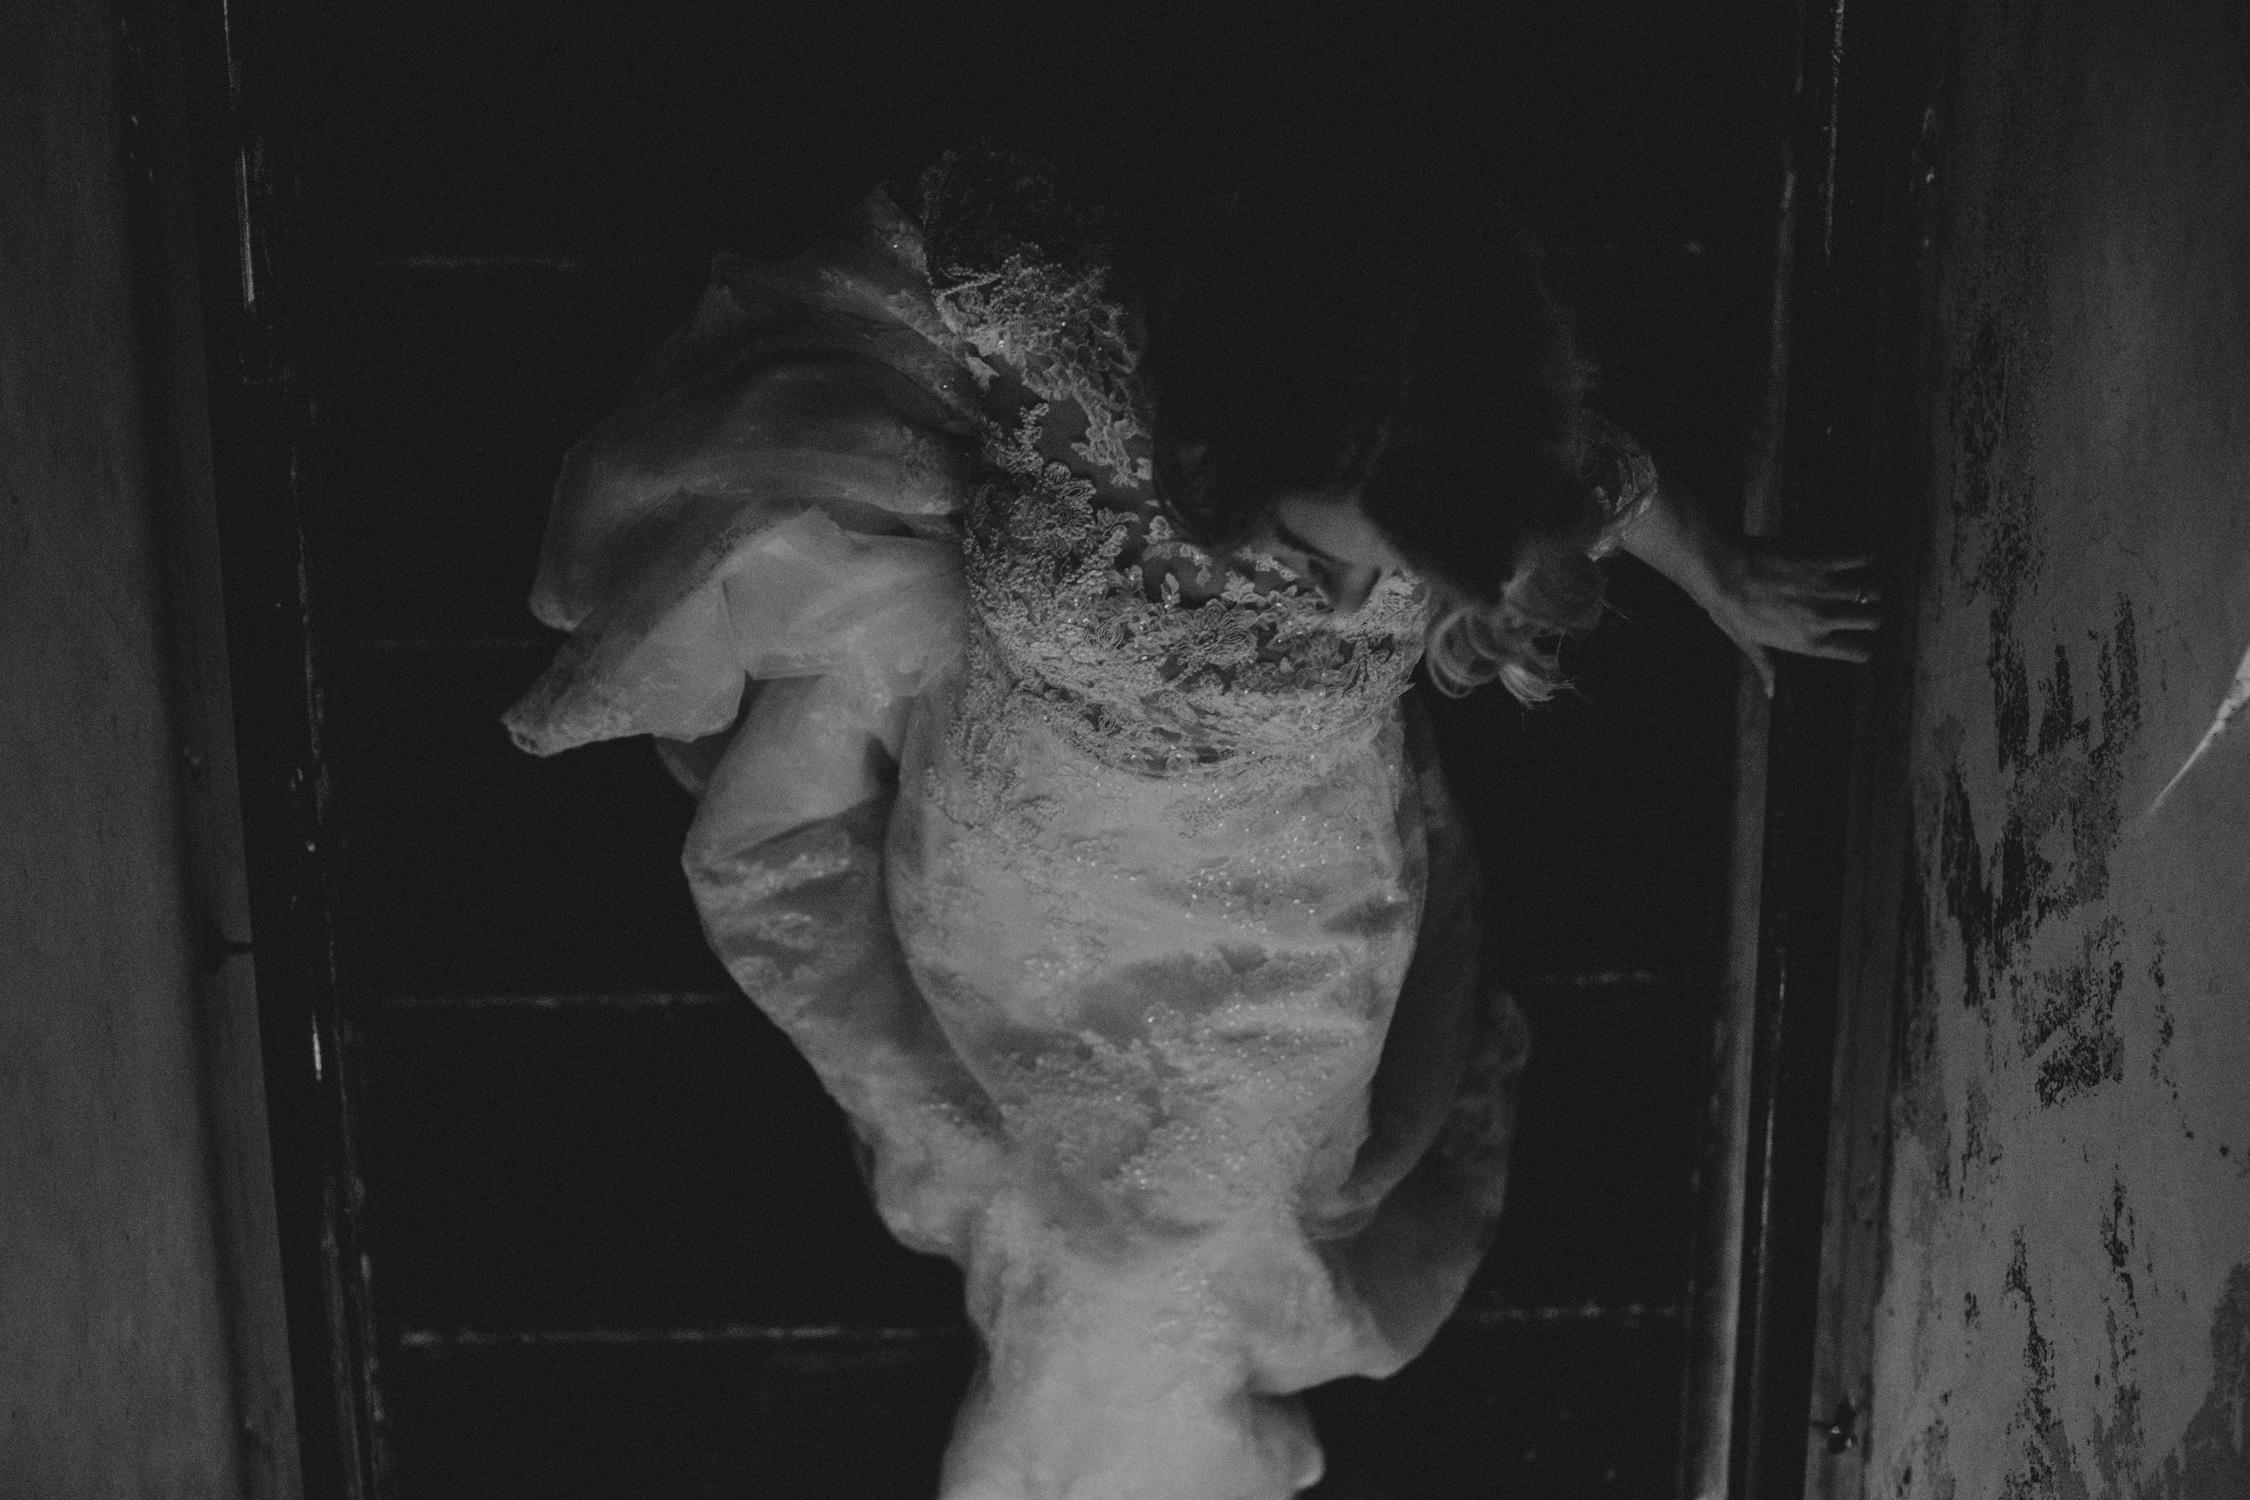 lucas_confectionery_wedding_030.jpg